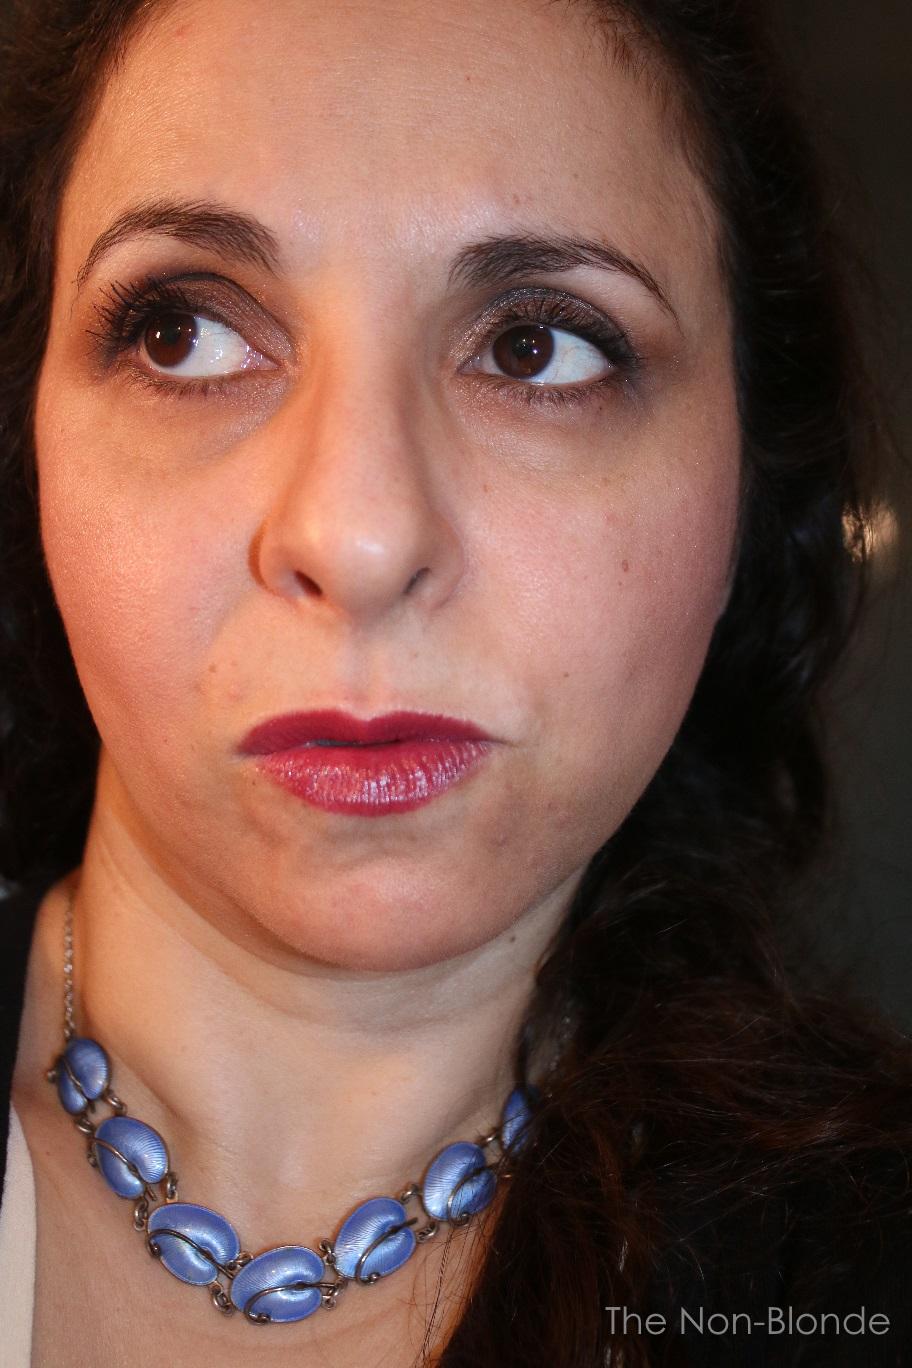 Bad Makeup On Tumblr: FotD: Makeup On A Bad Skin Day